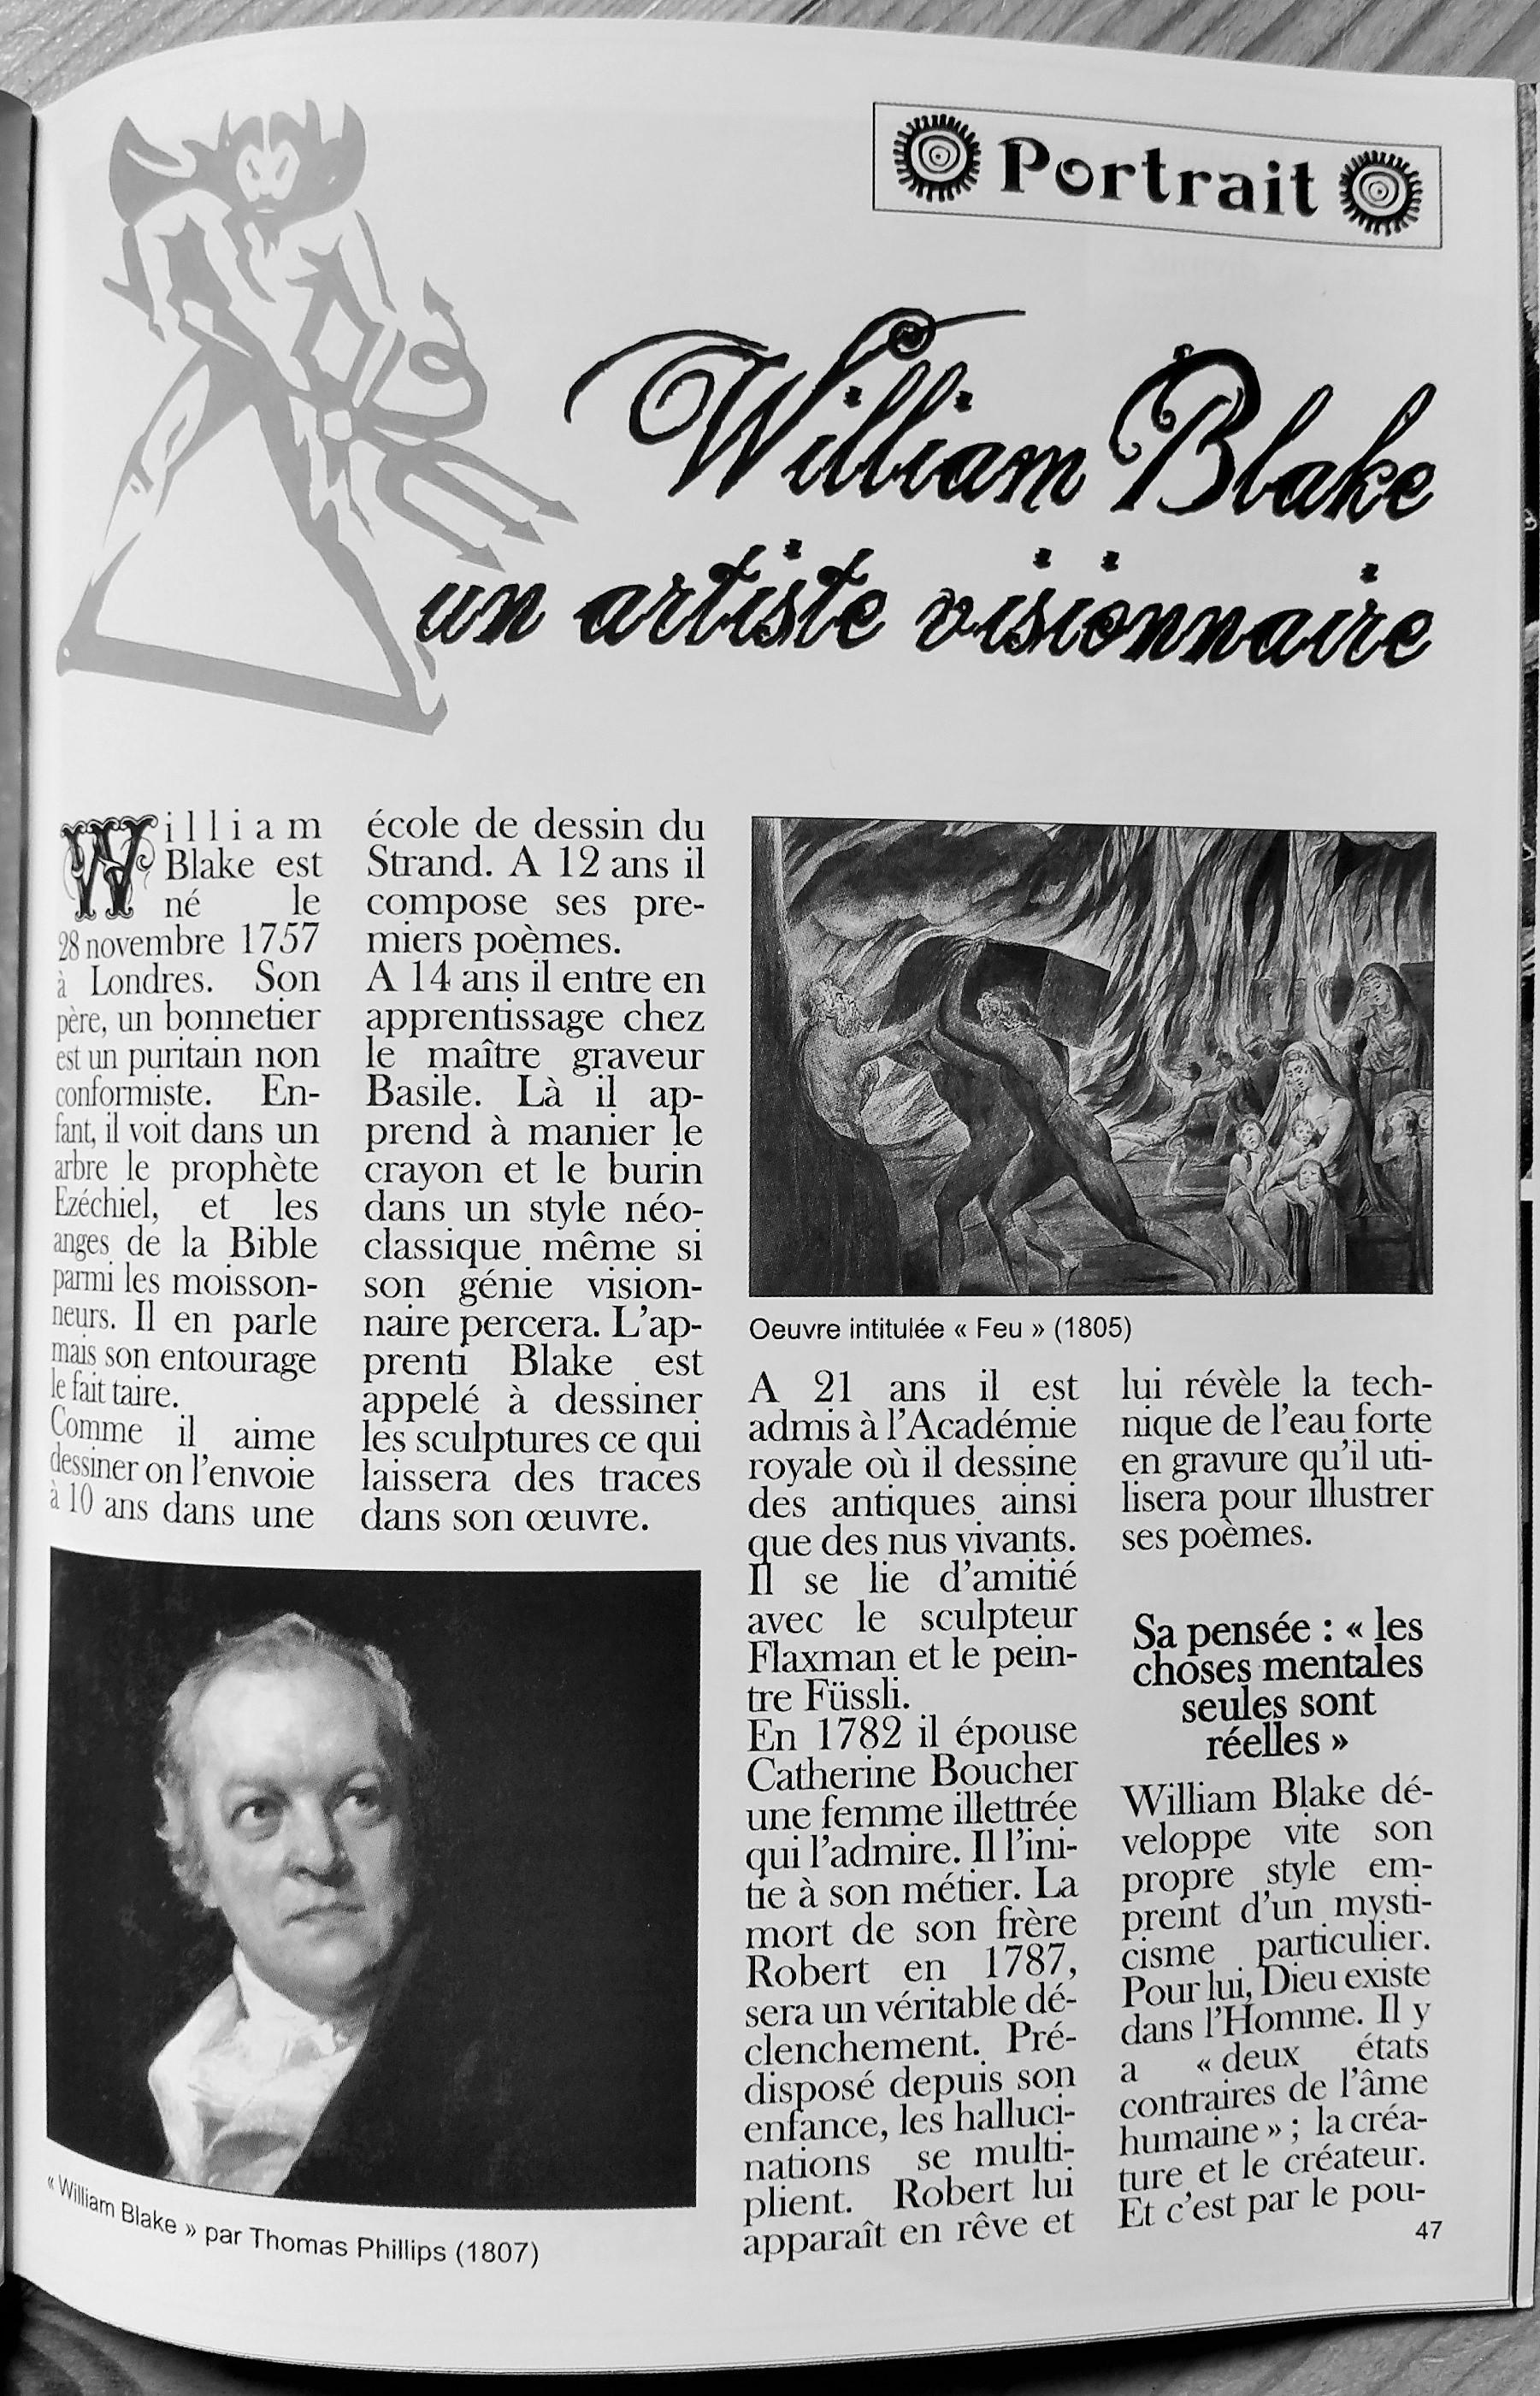 William Blake, un artiste visionnaire